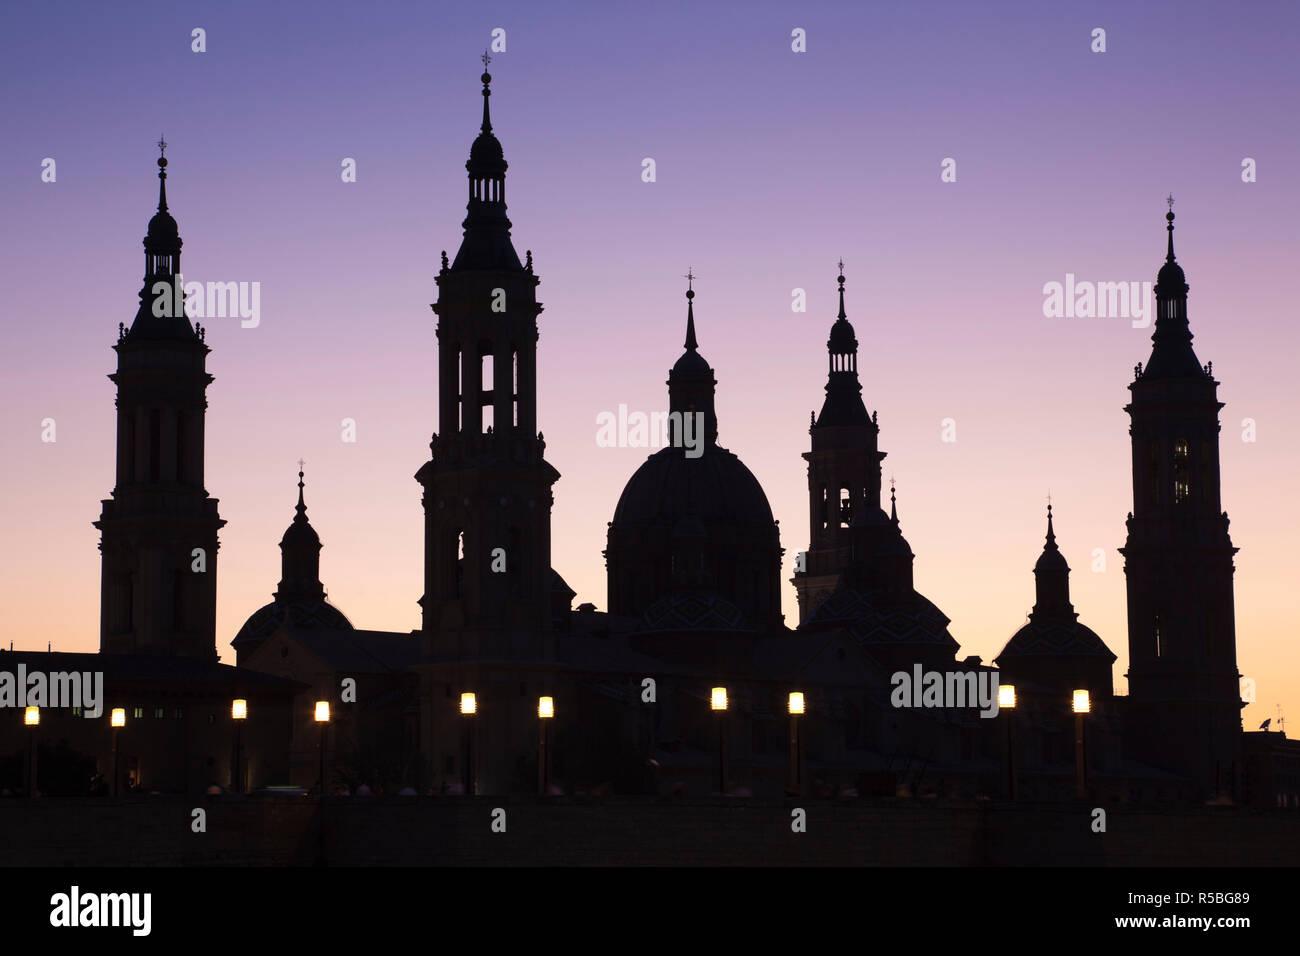 Spain, Aragon Region, Zaragoza Province, Zaragoza, Basilica de Nuestra Senora de Pilar and the Puente de Piedra bridge, on the Ebro River - Stock Image